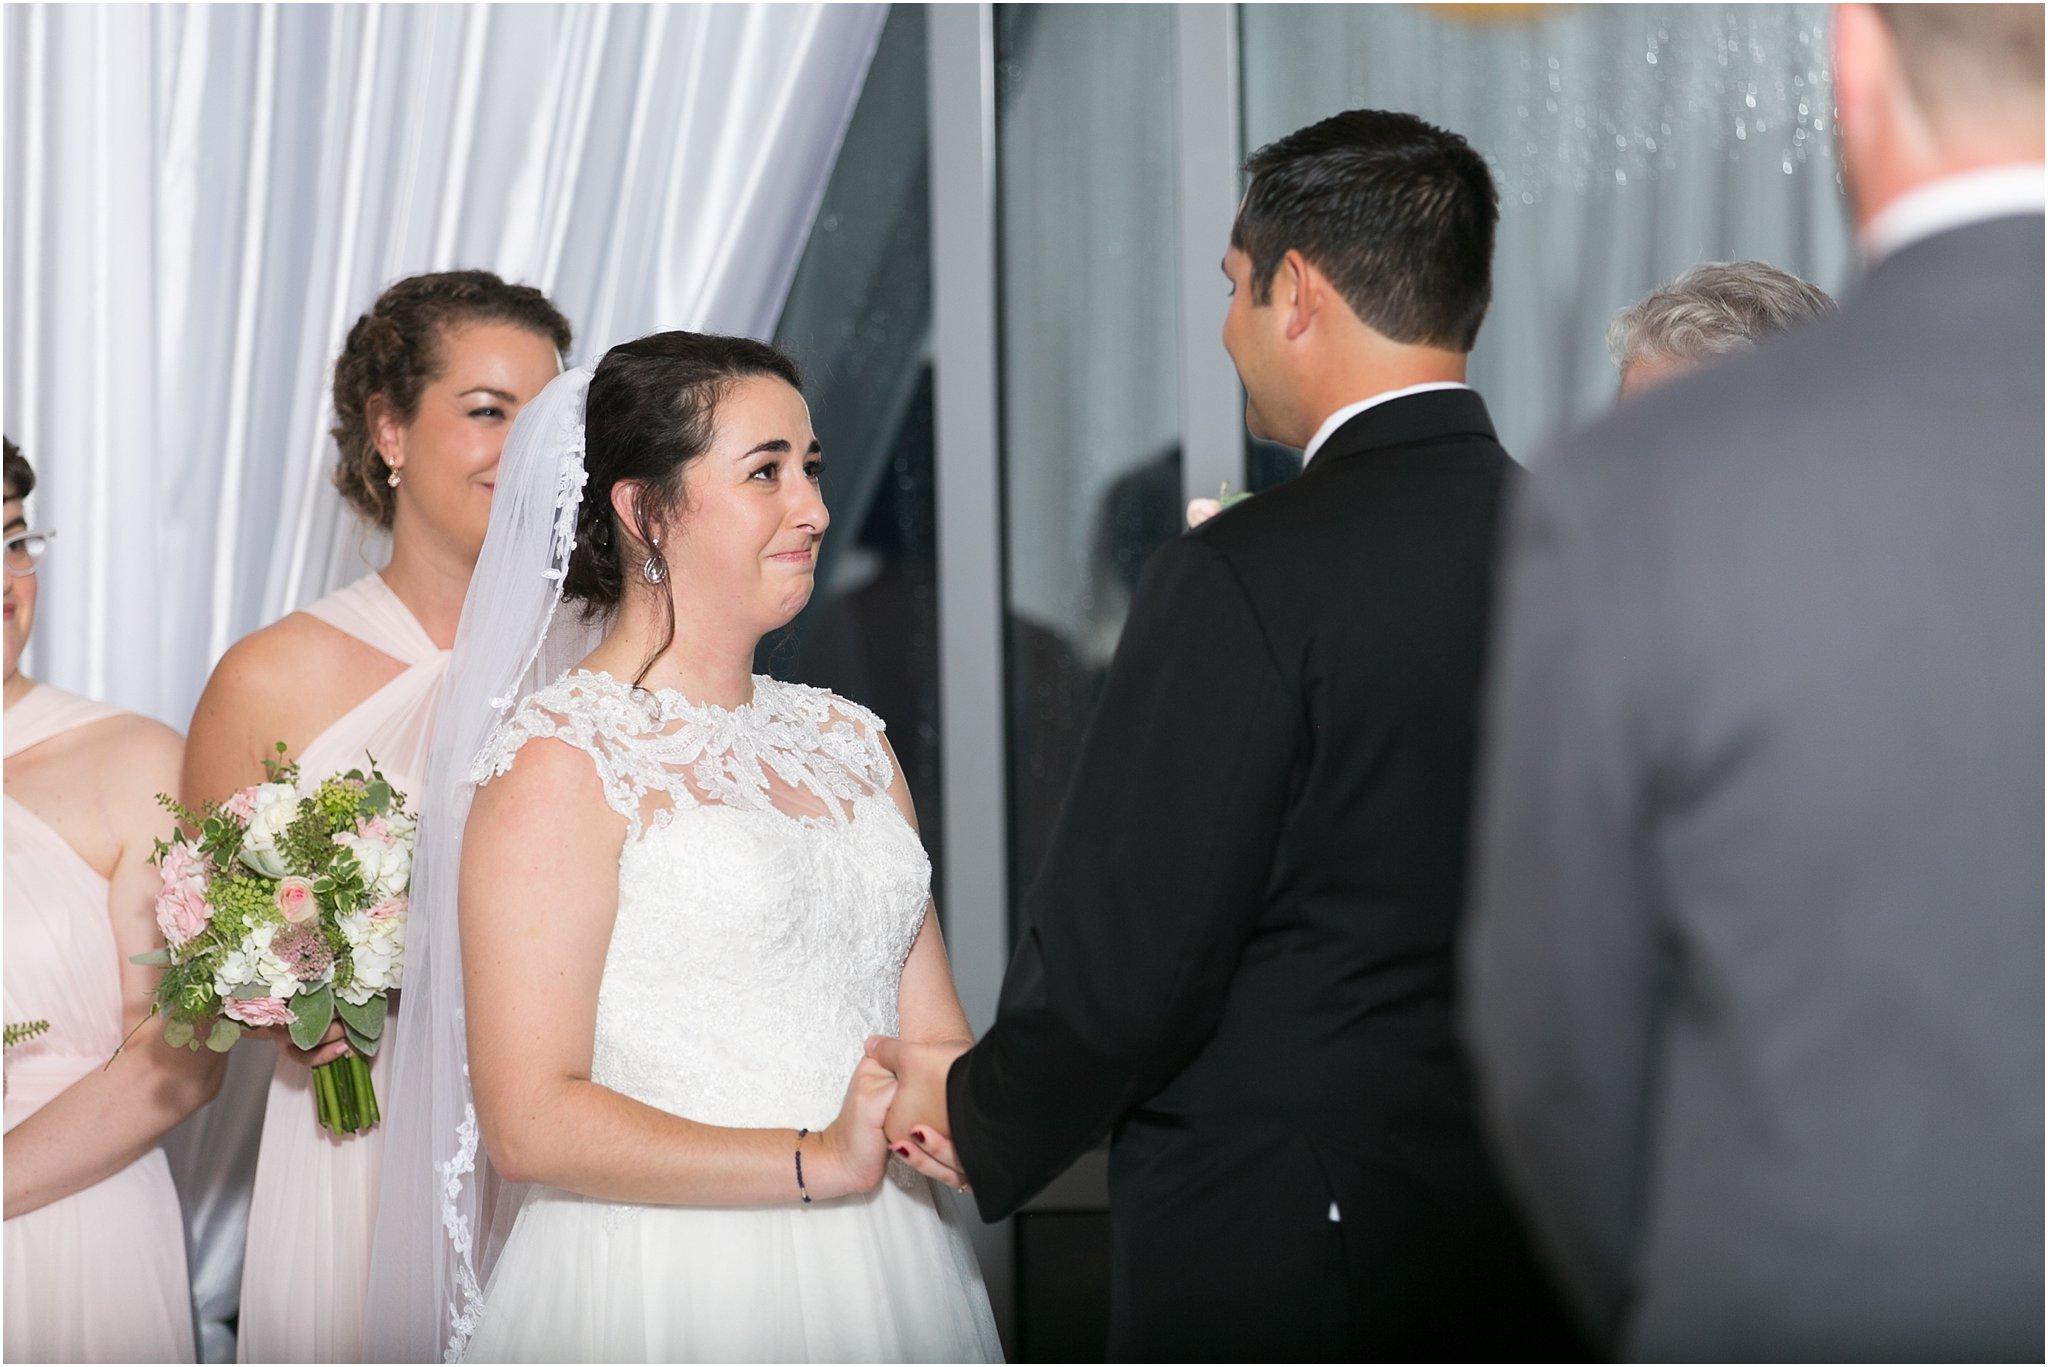 jessica_ryan_photography_virginia_wedding_photographer_wedding_hurricane_norfolk_botanical_gardens_hurricane_matthew_wedding_3591